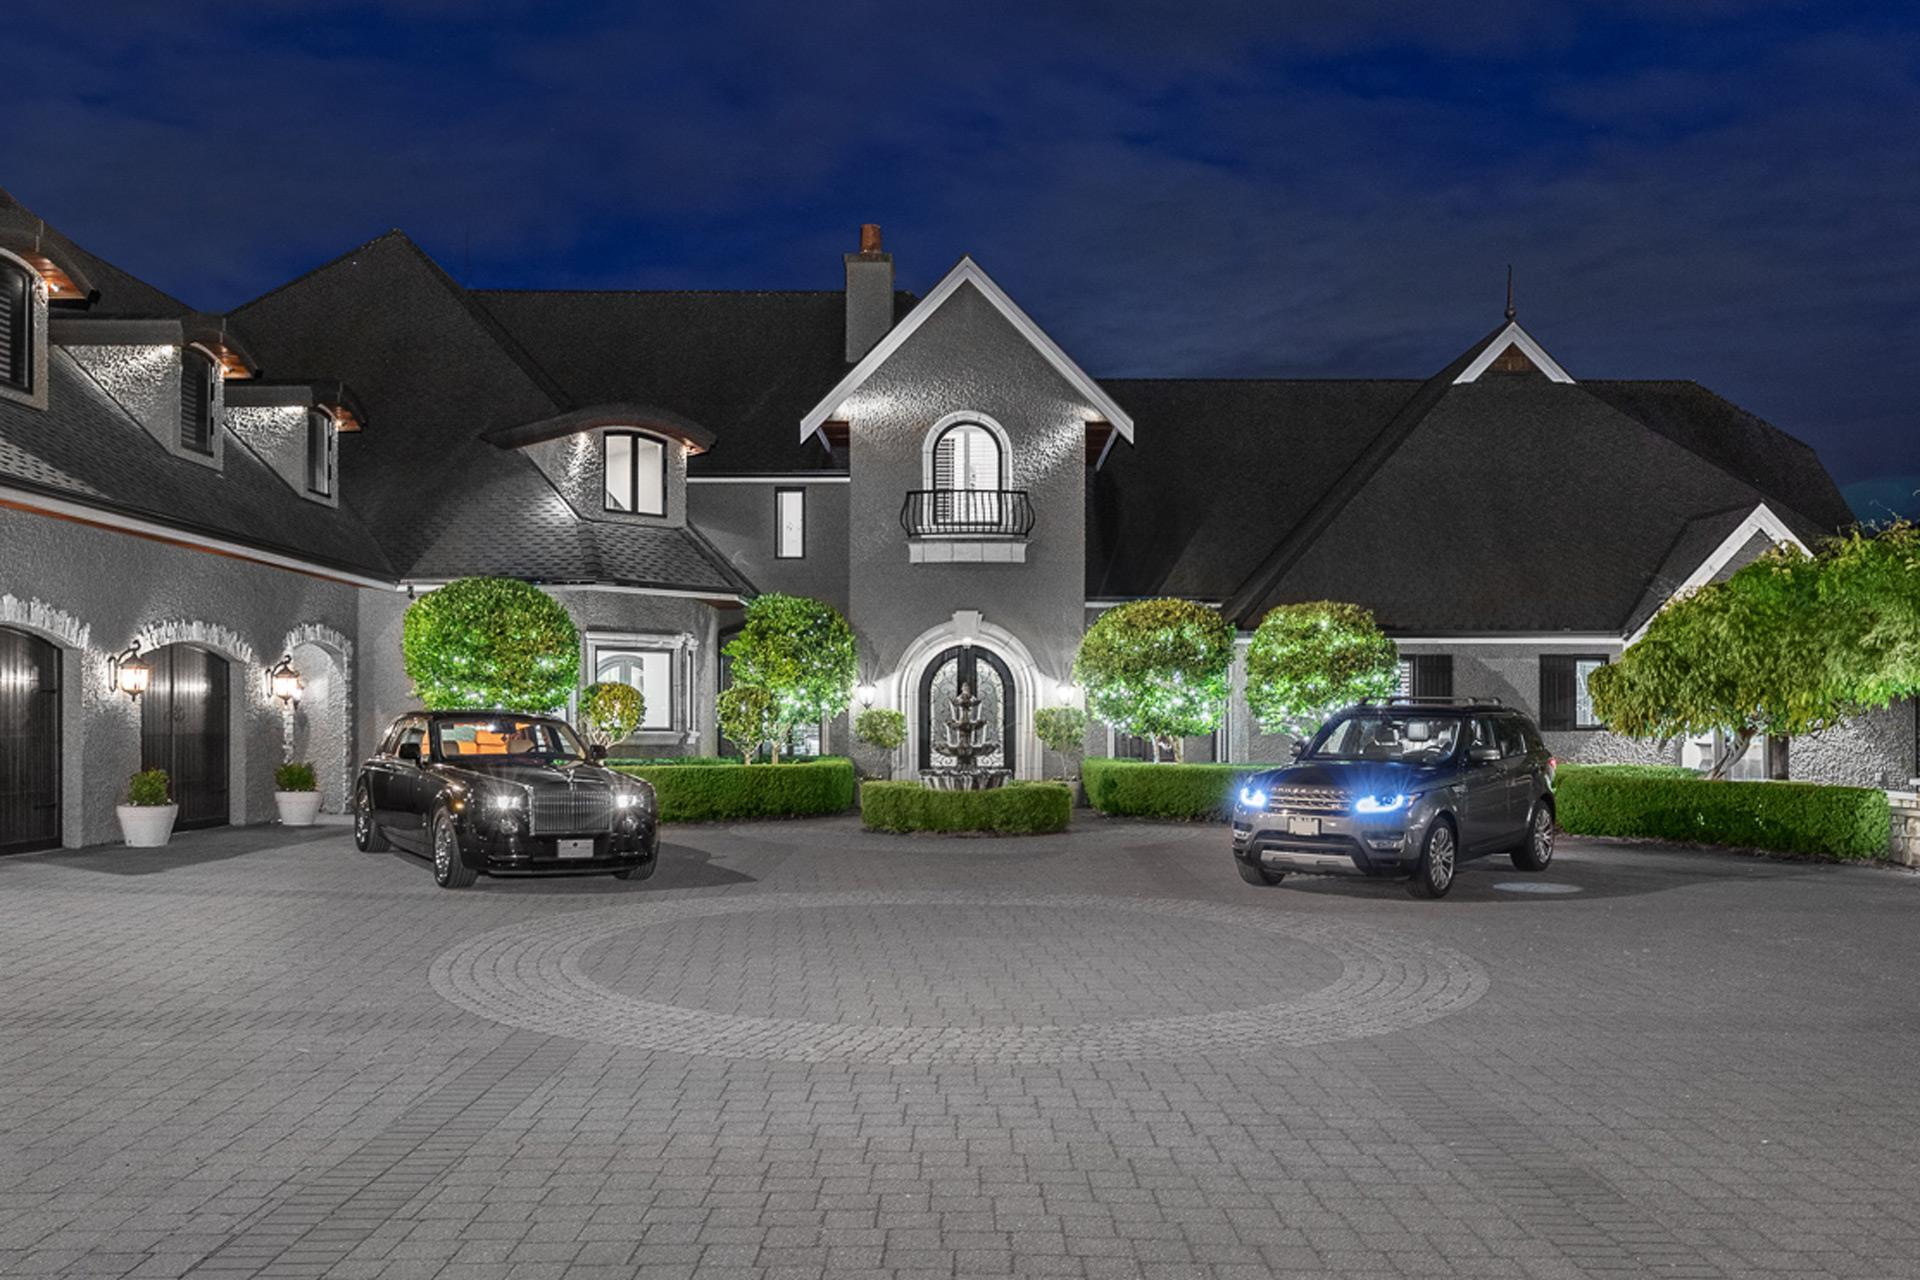 Villa Bellavita -  South Langley,